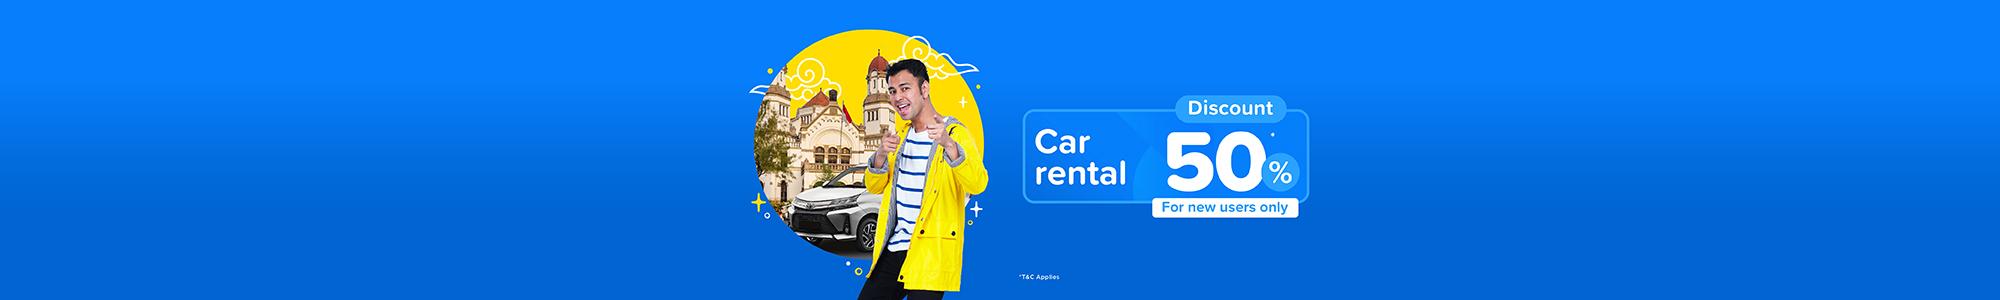 Promo Sewa Mobil Diskon 50% - tiket.com